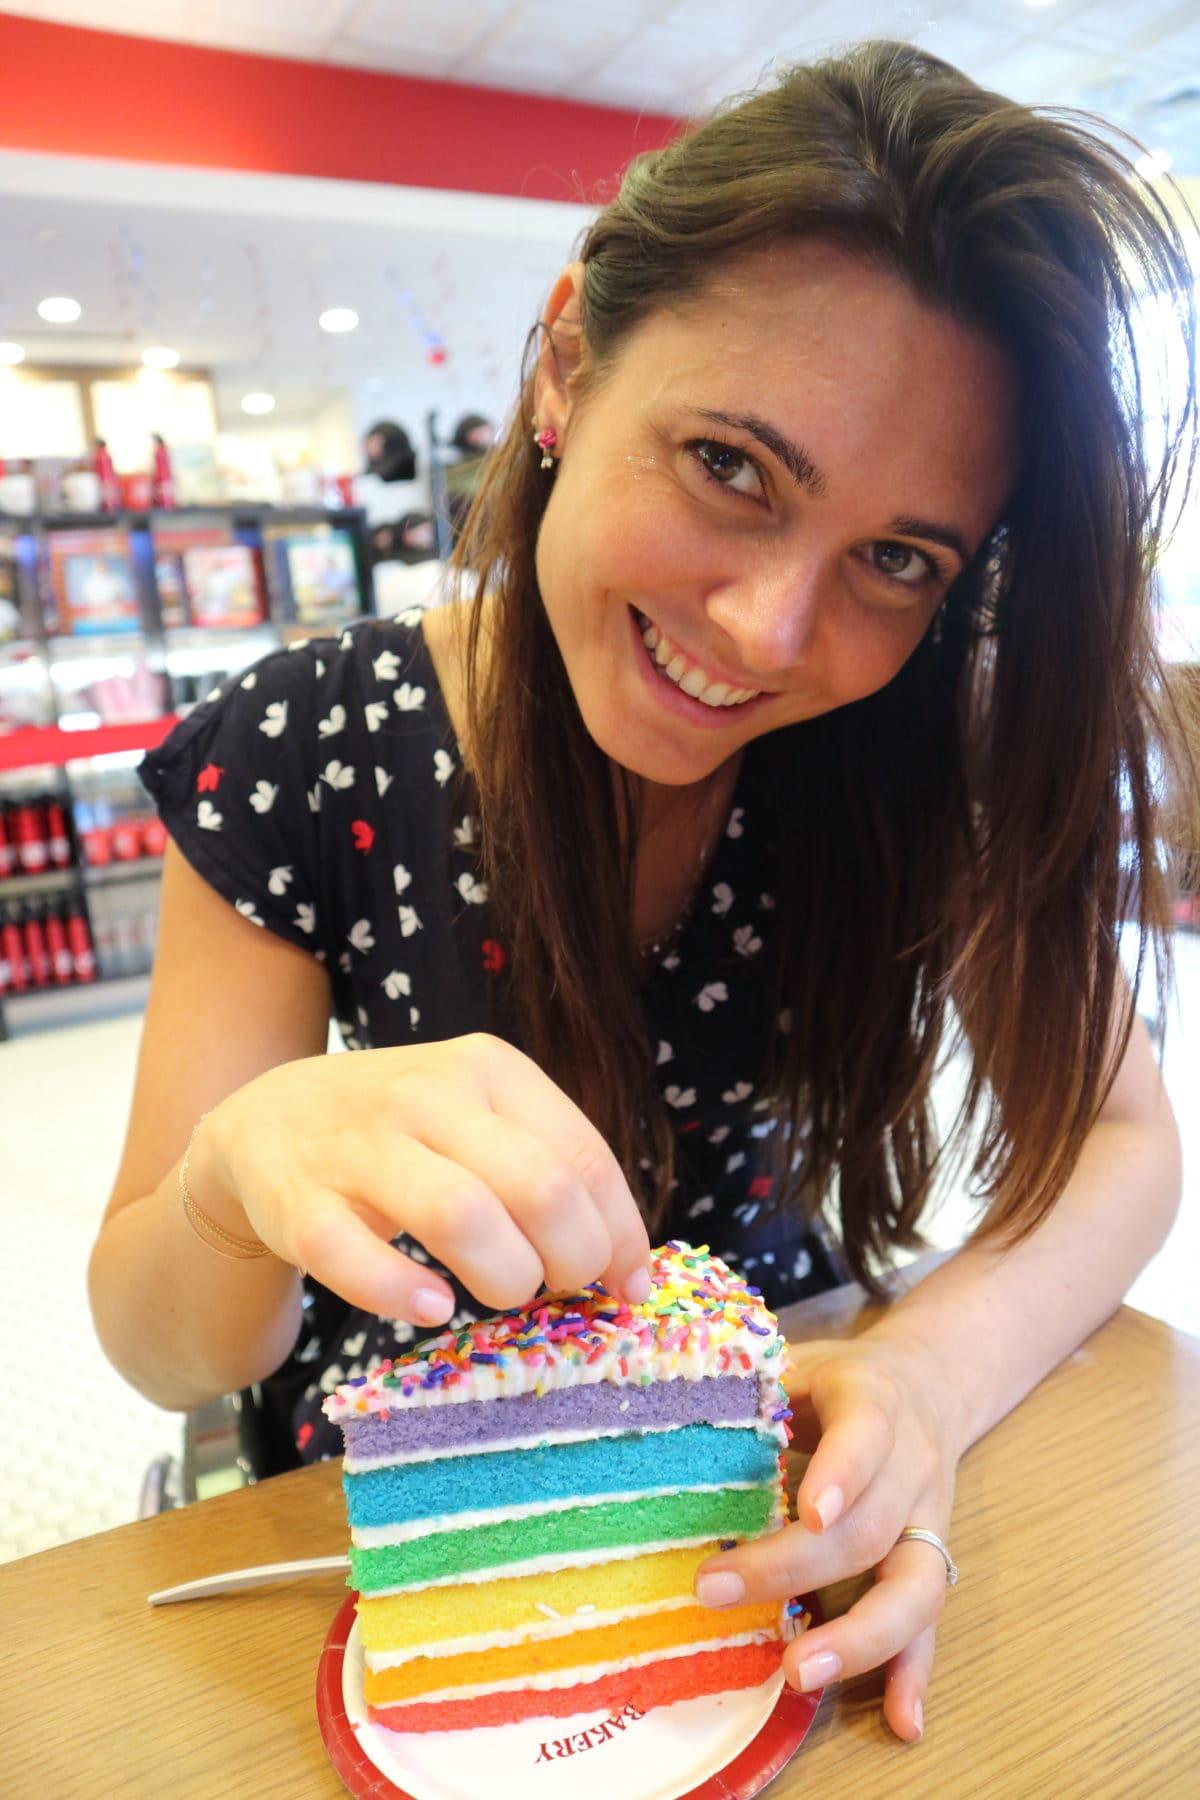 bakery con rainbow cake